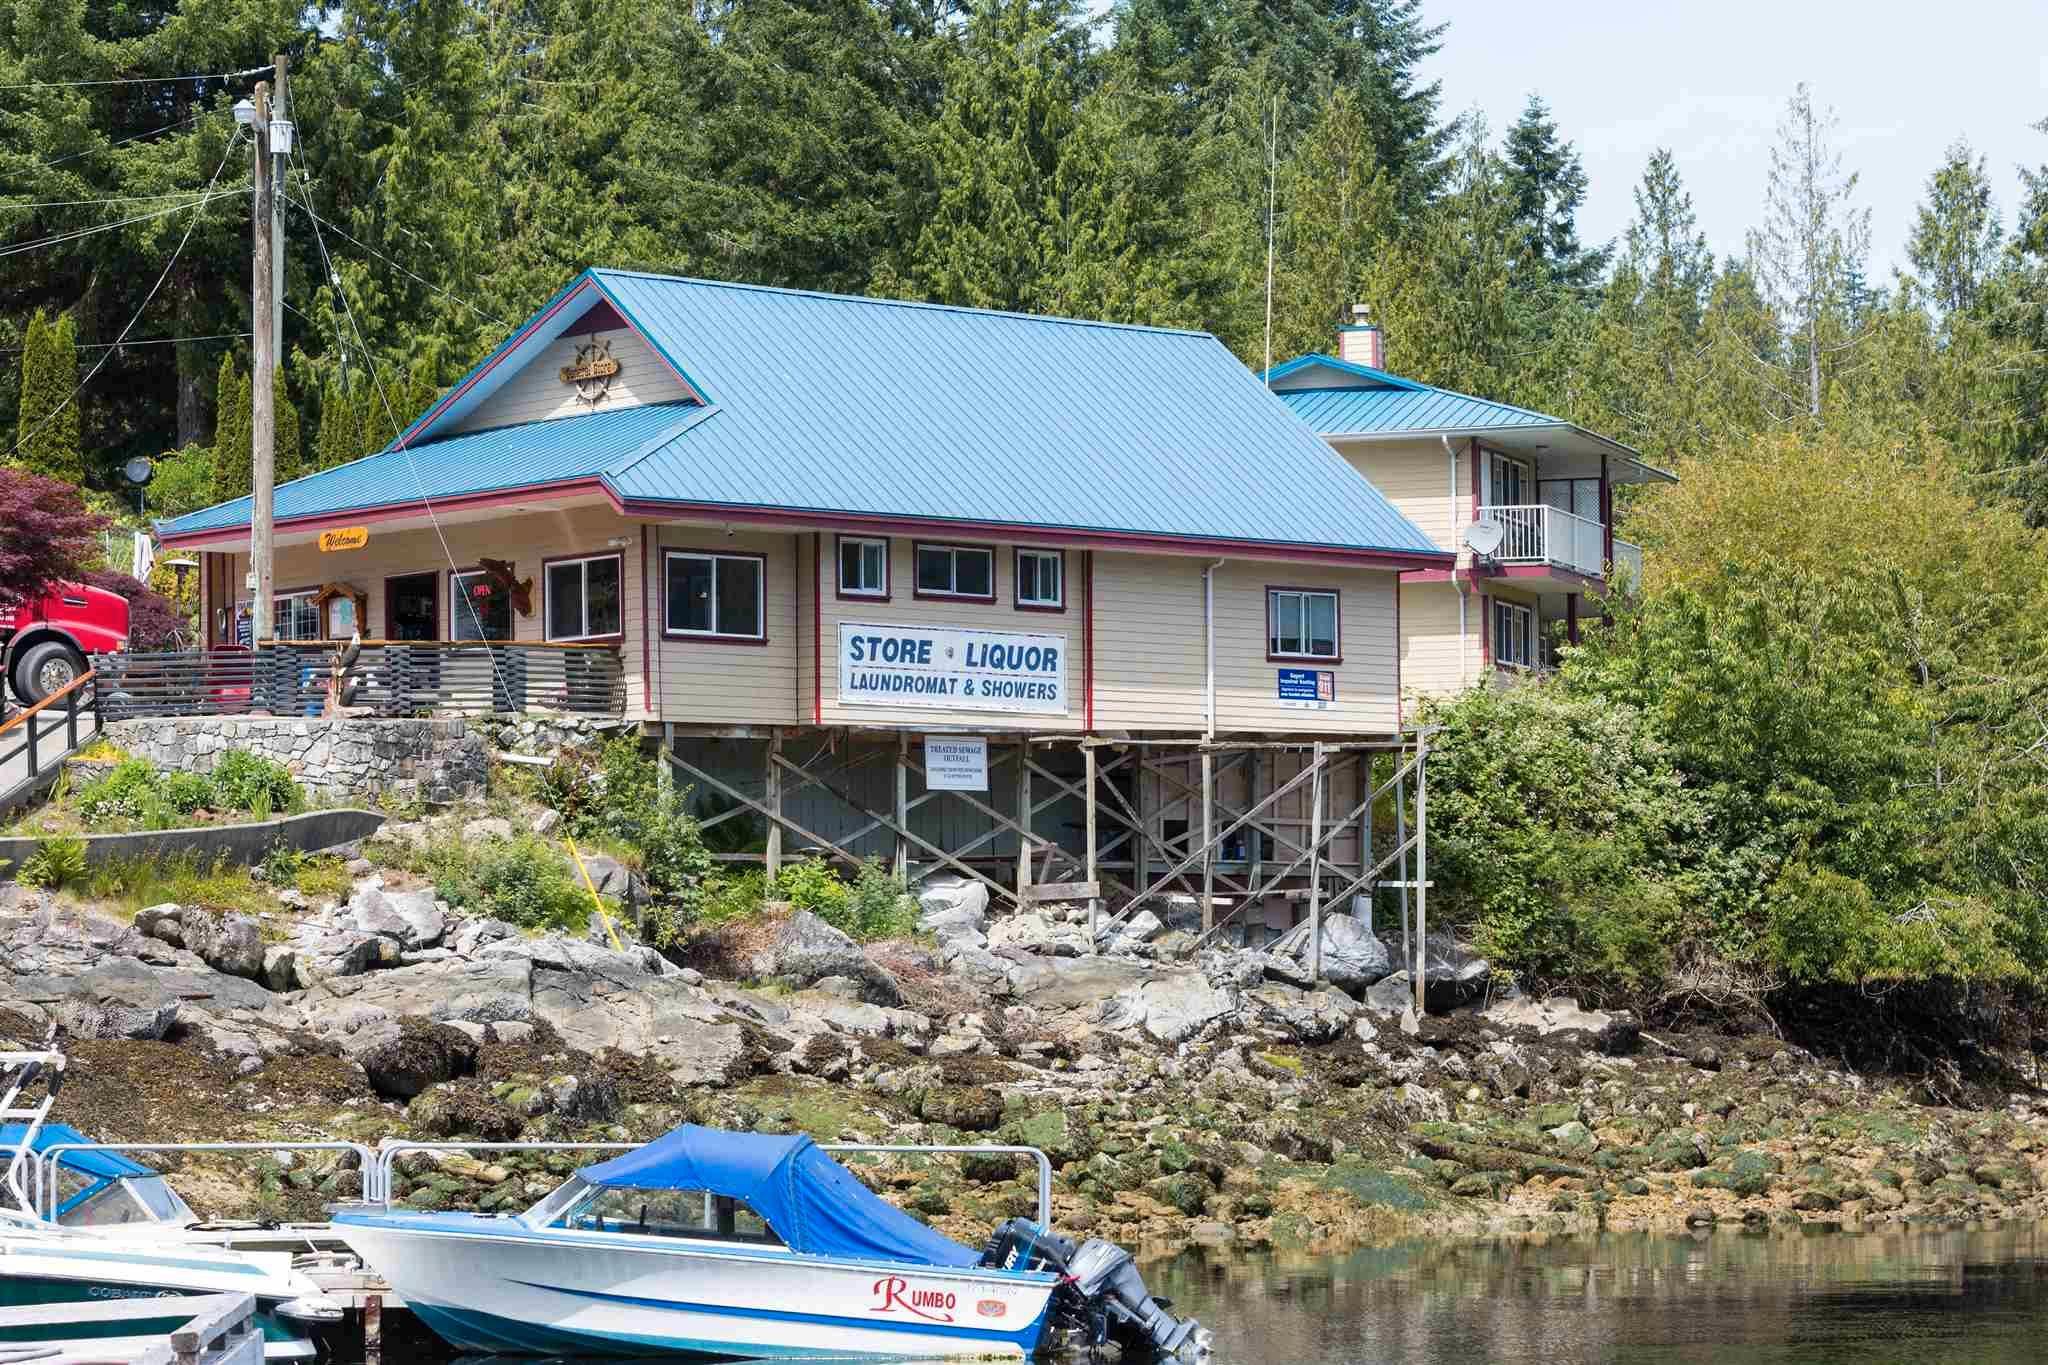 Photo 11: Photos: 6781 BATHGATE Road in Egmont: Pender Harbour Egmont House for sale (Sunshine Coast)  : MLS®# R2593981